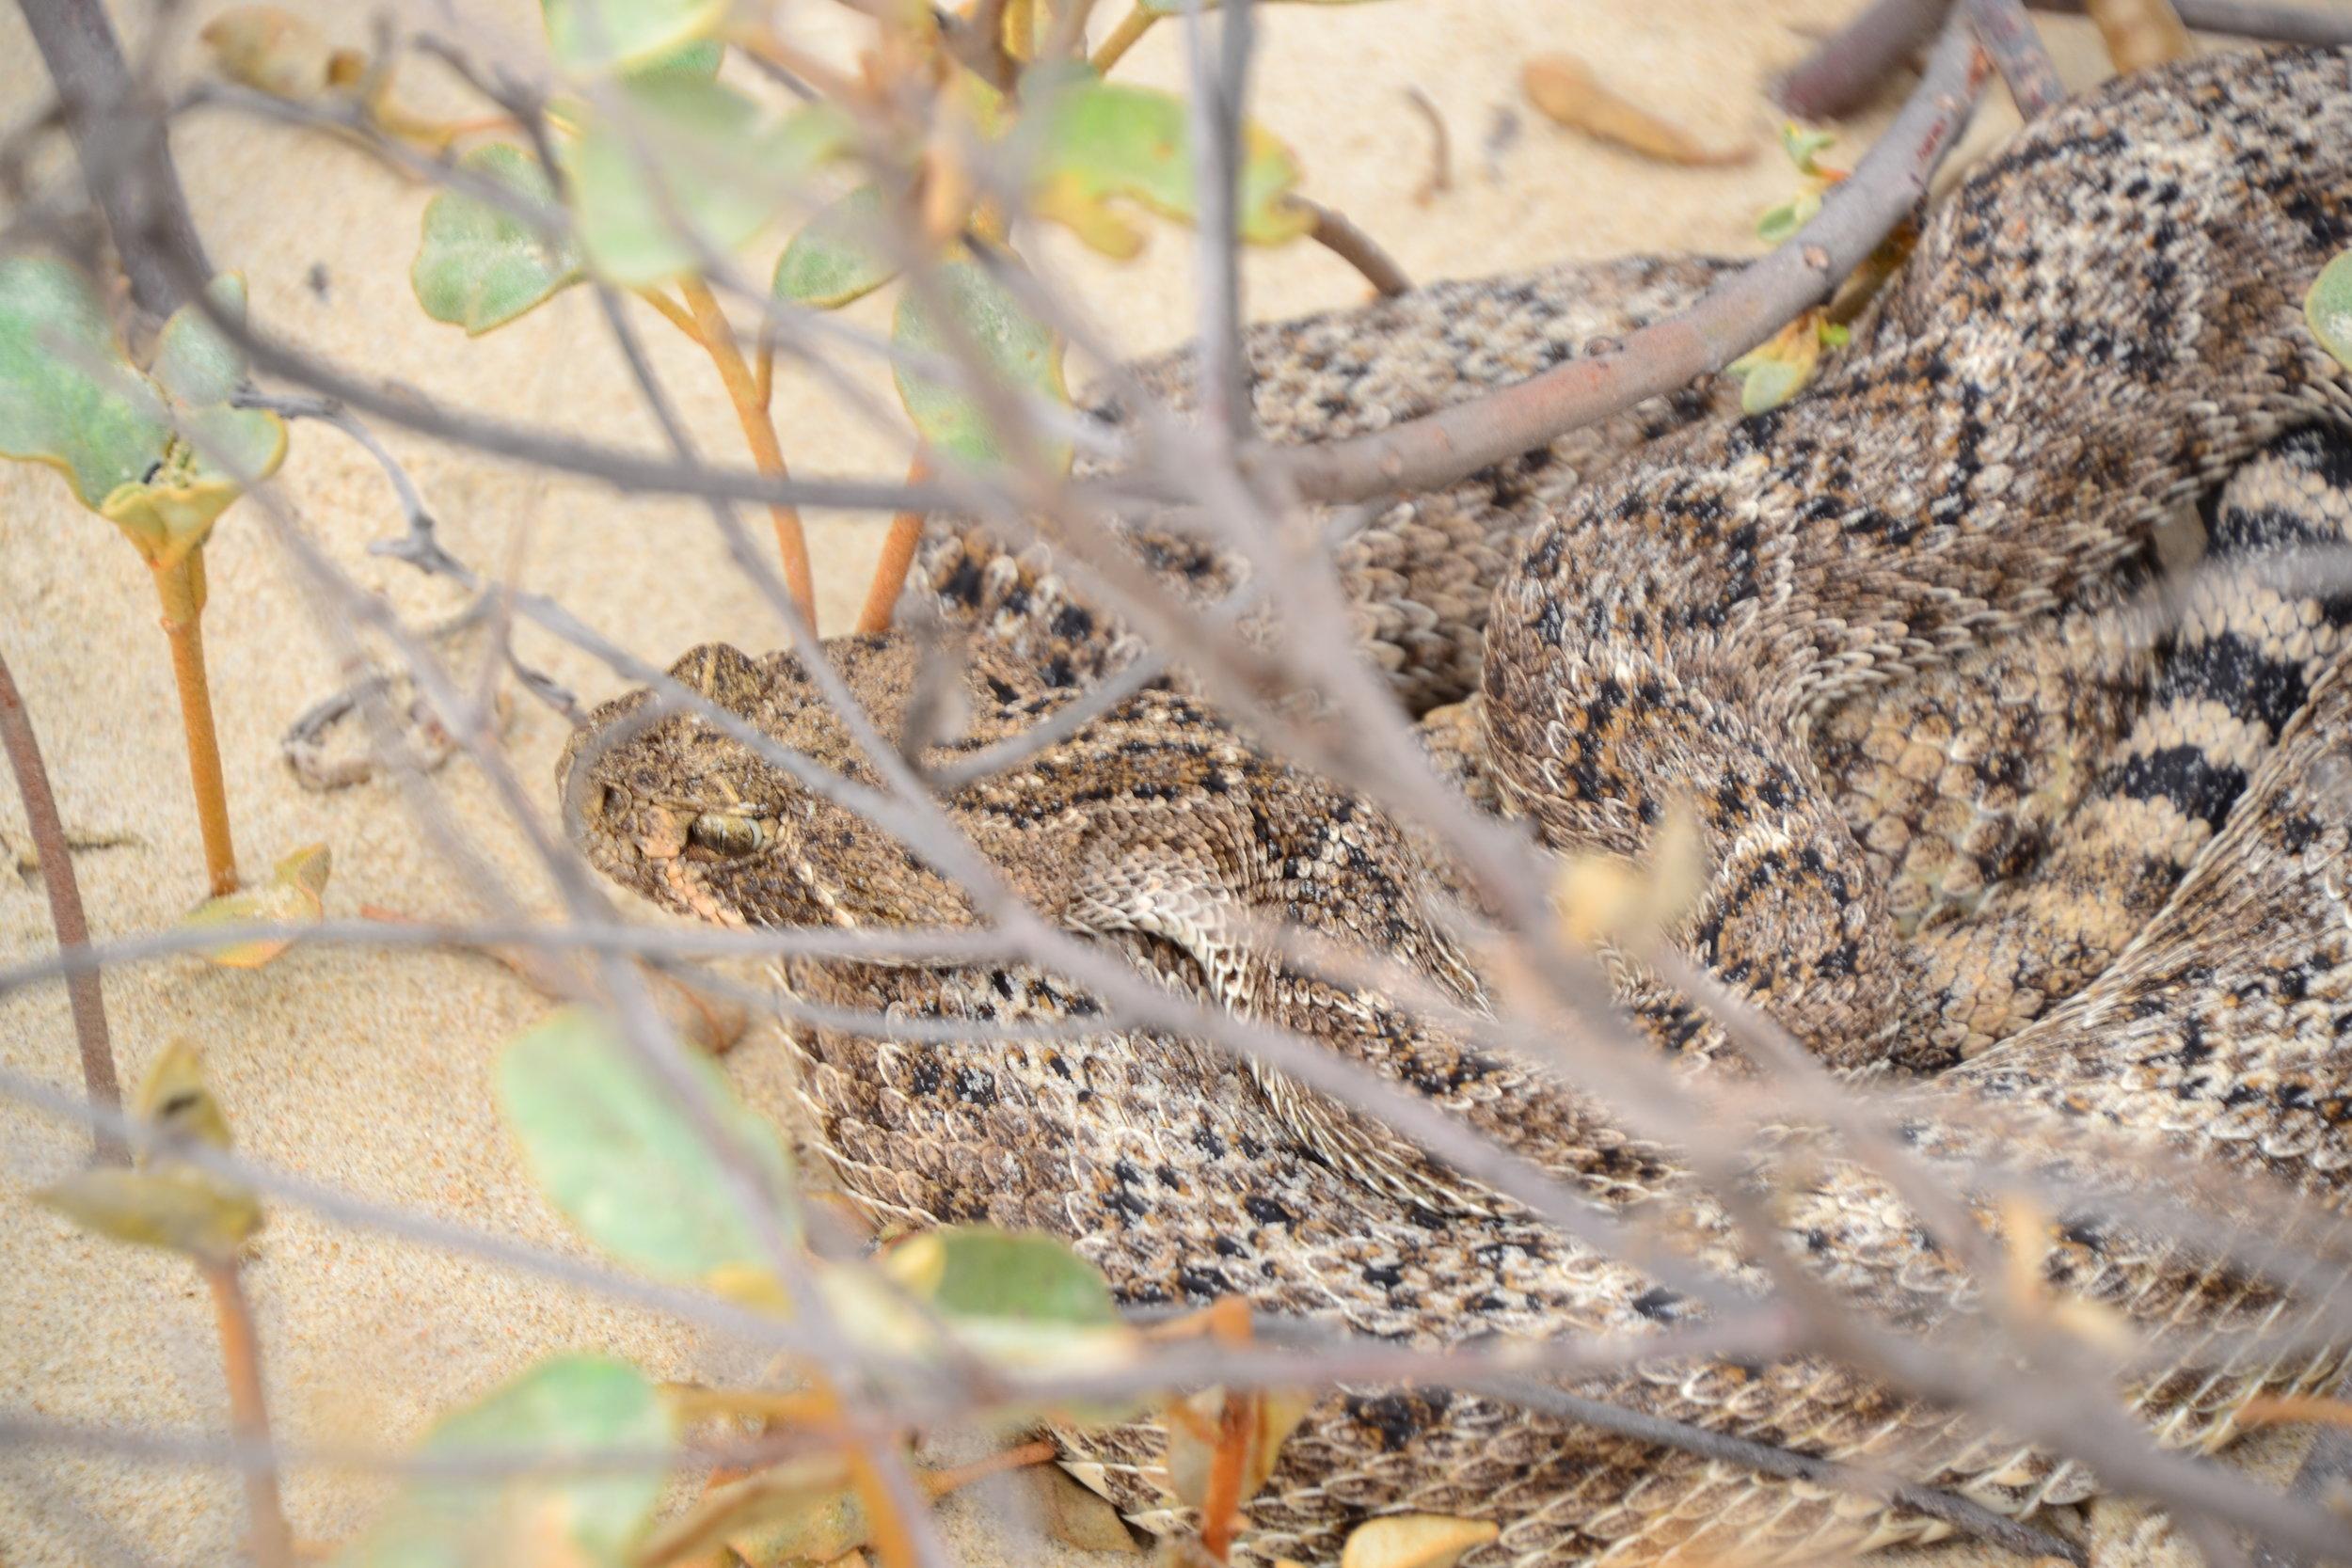 Rattlesnake in the backbeach Gulf Croton.